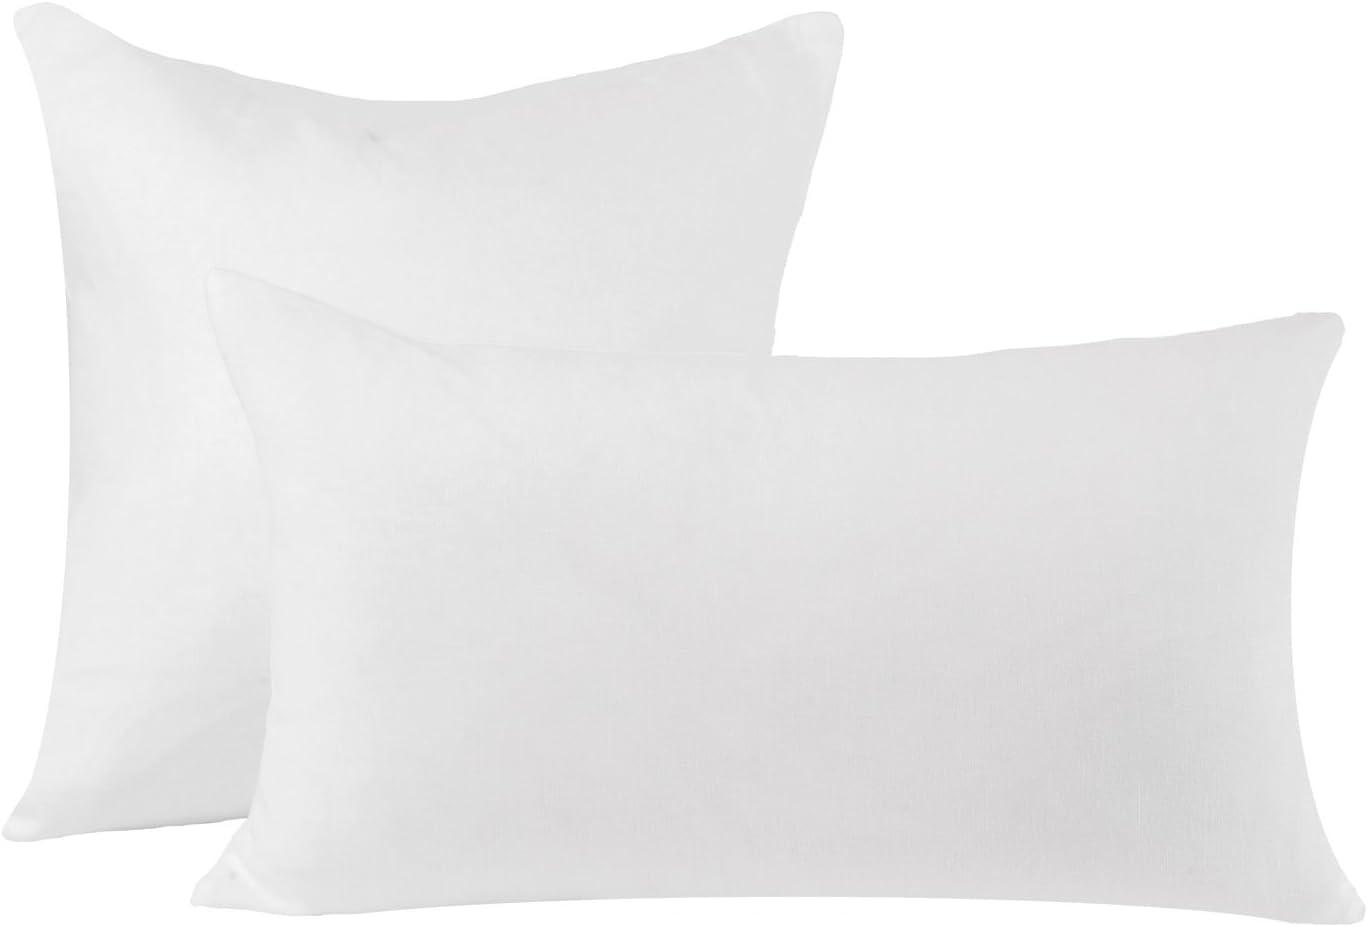 Huddleson Decorative Throw 1 year warranty Pillow Department store Insert 12